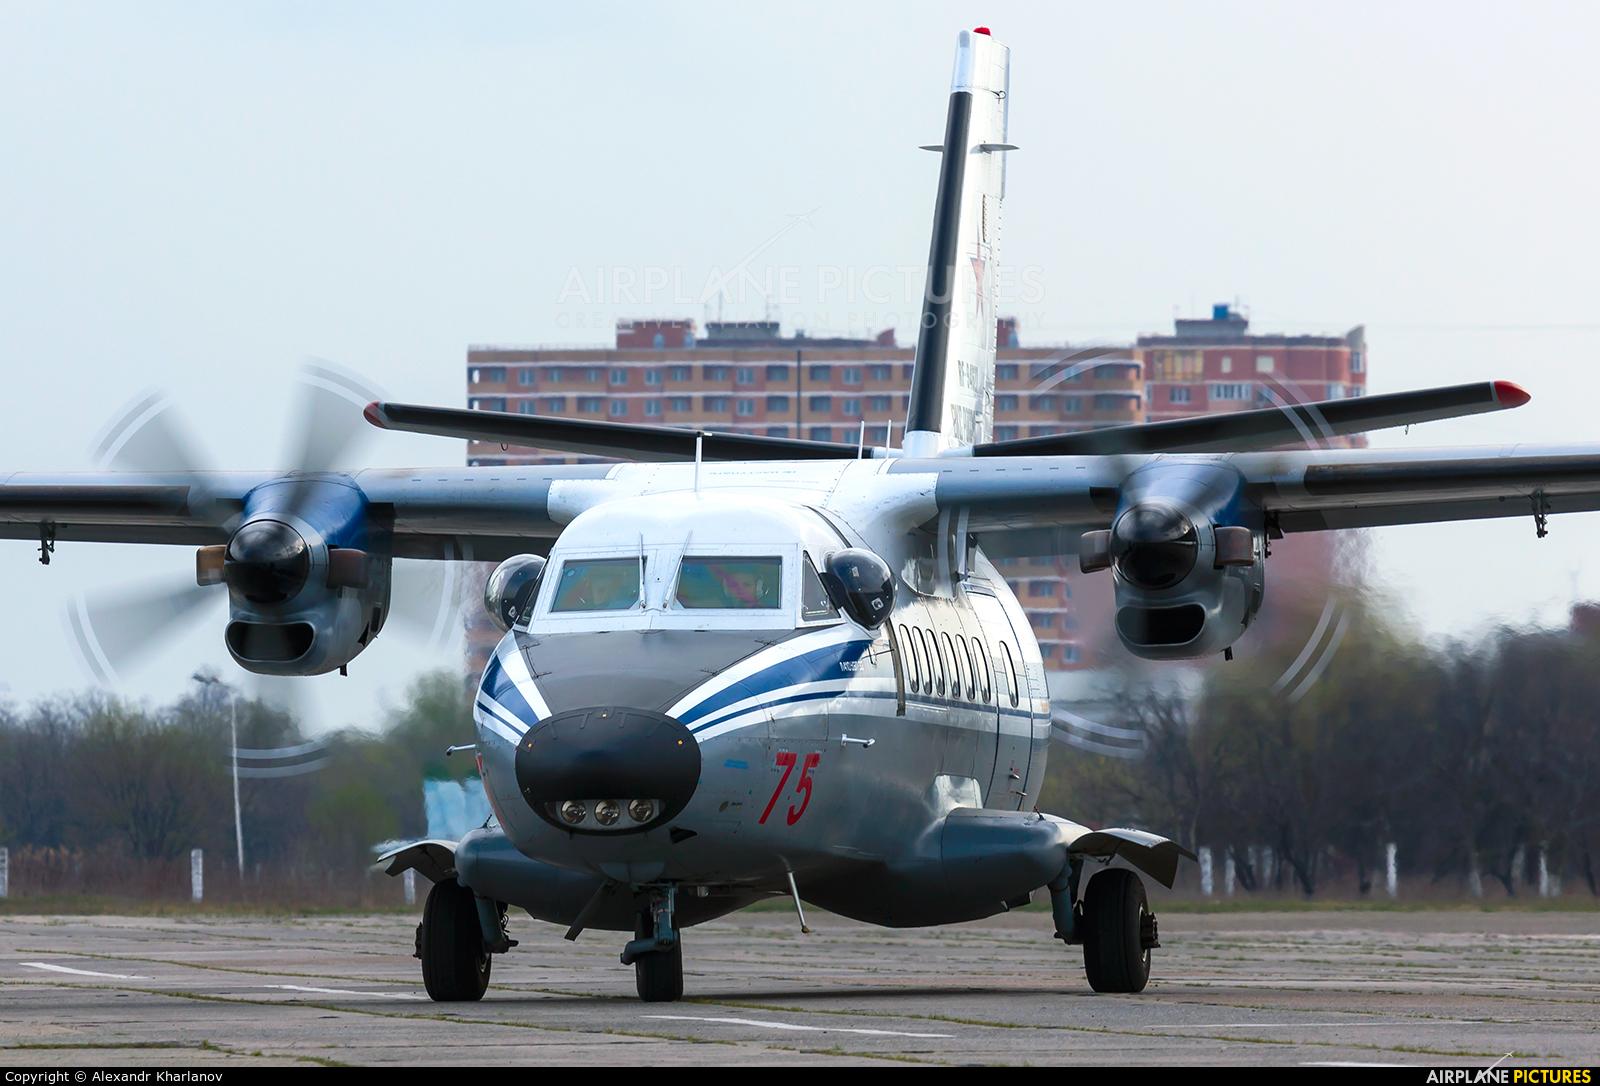 Russia - Air Force 75 aircraft at Krasnodar Tsentralny